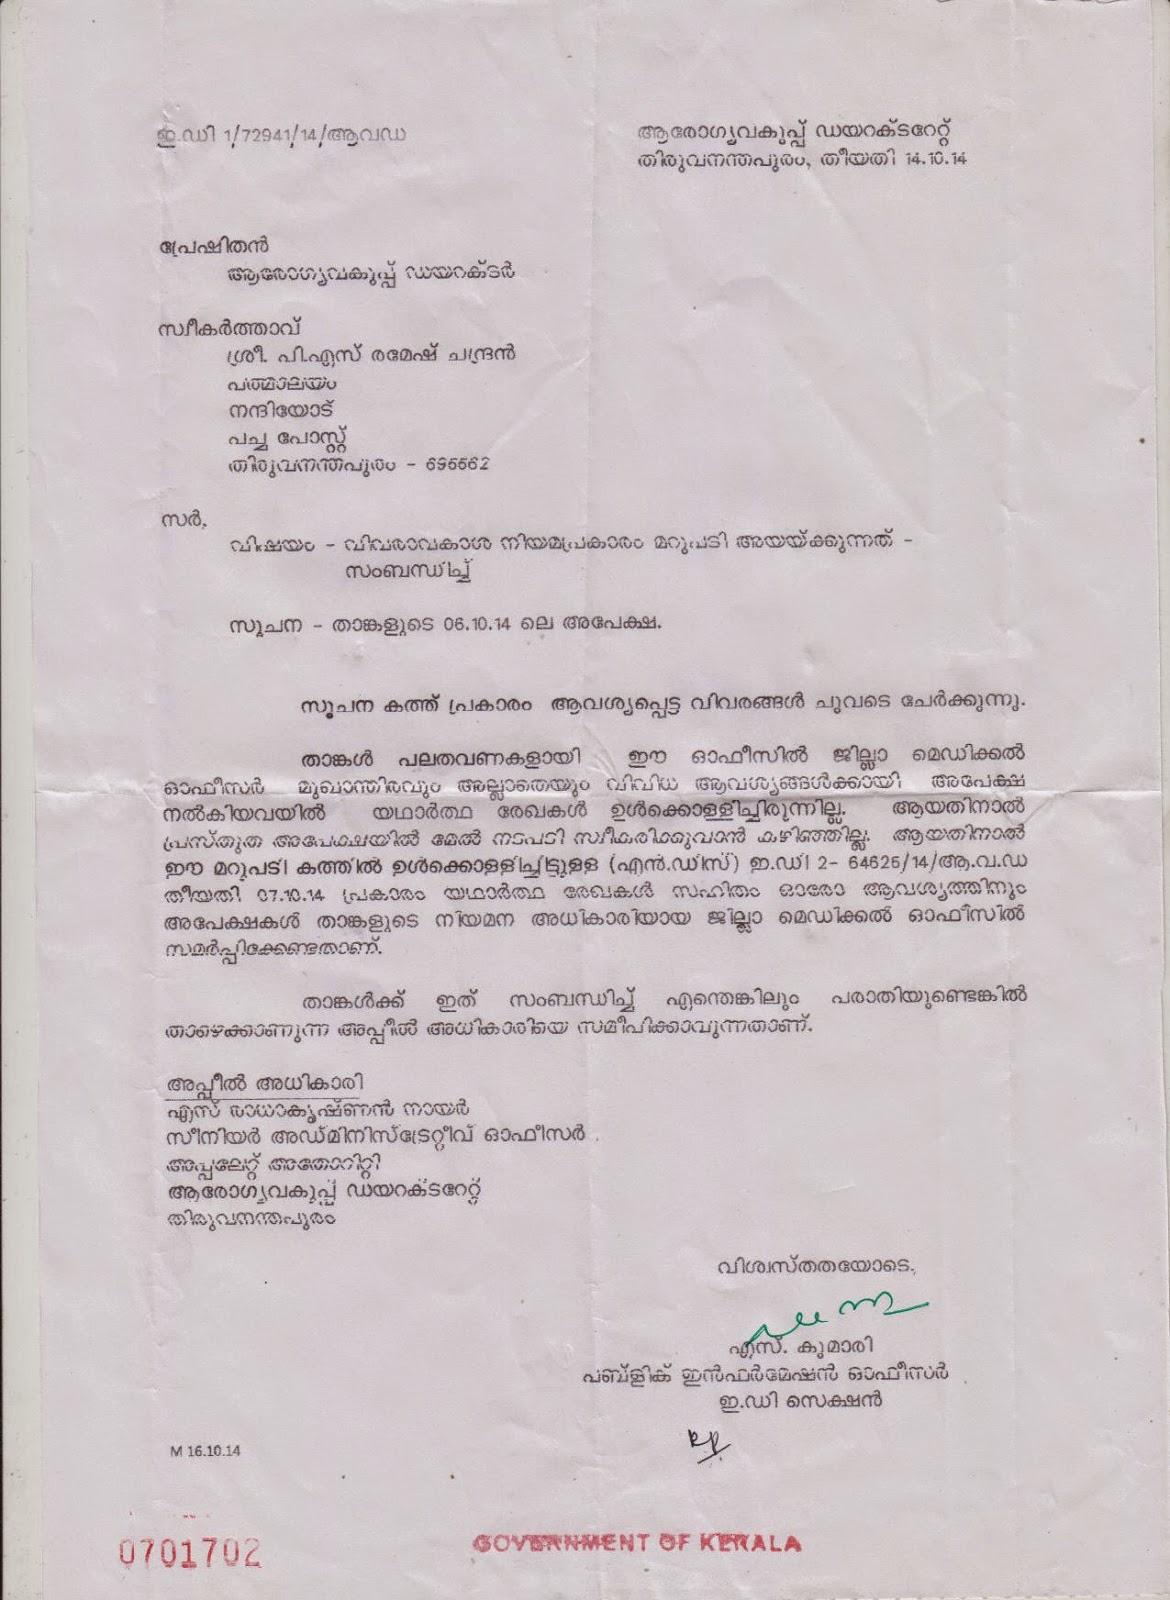 Malayalam Letter Format For Students.  Official Letter Malayalam Kerala Health Research official letter malayalam 28 images vivaravakasa niyamam oru